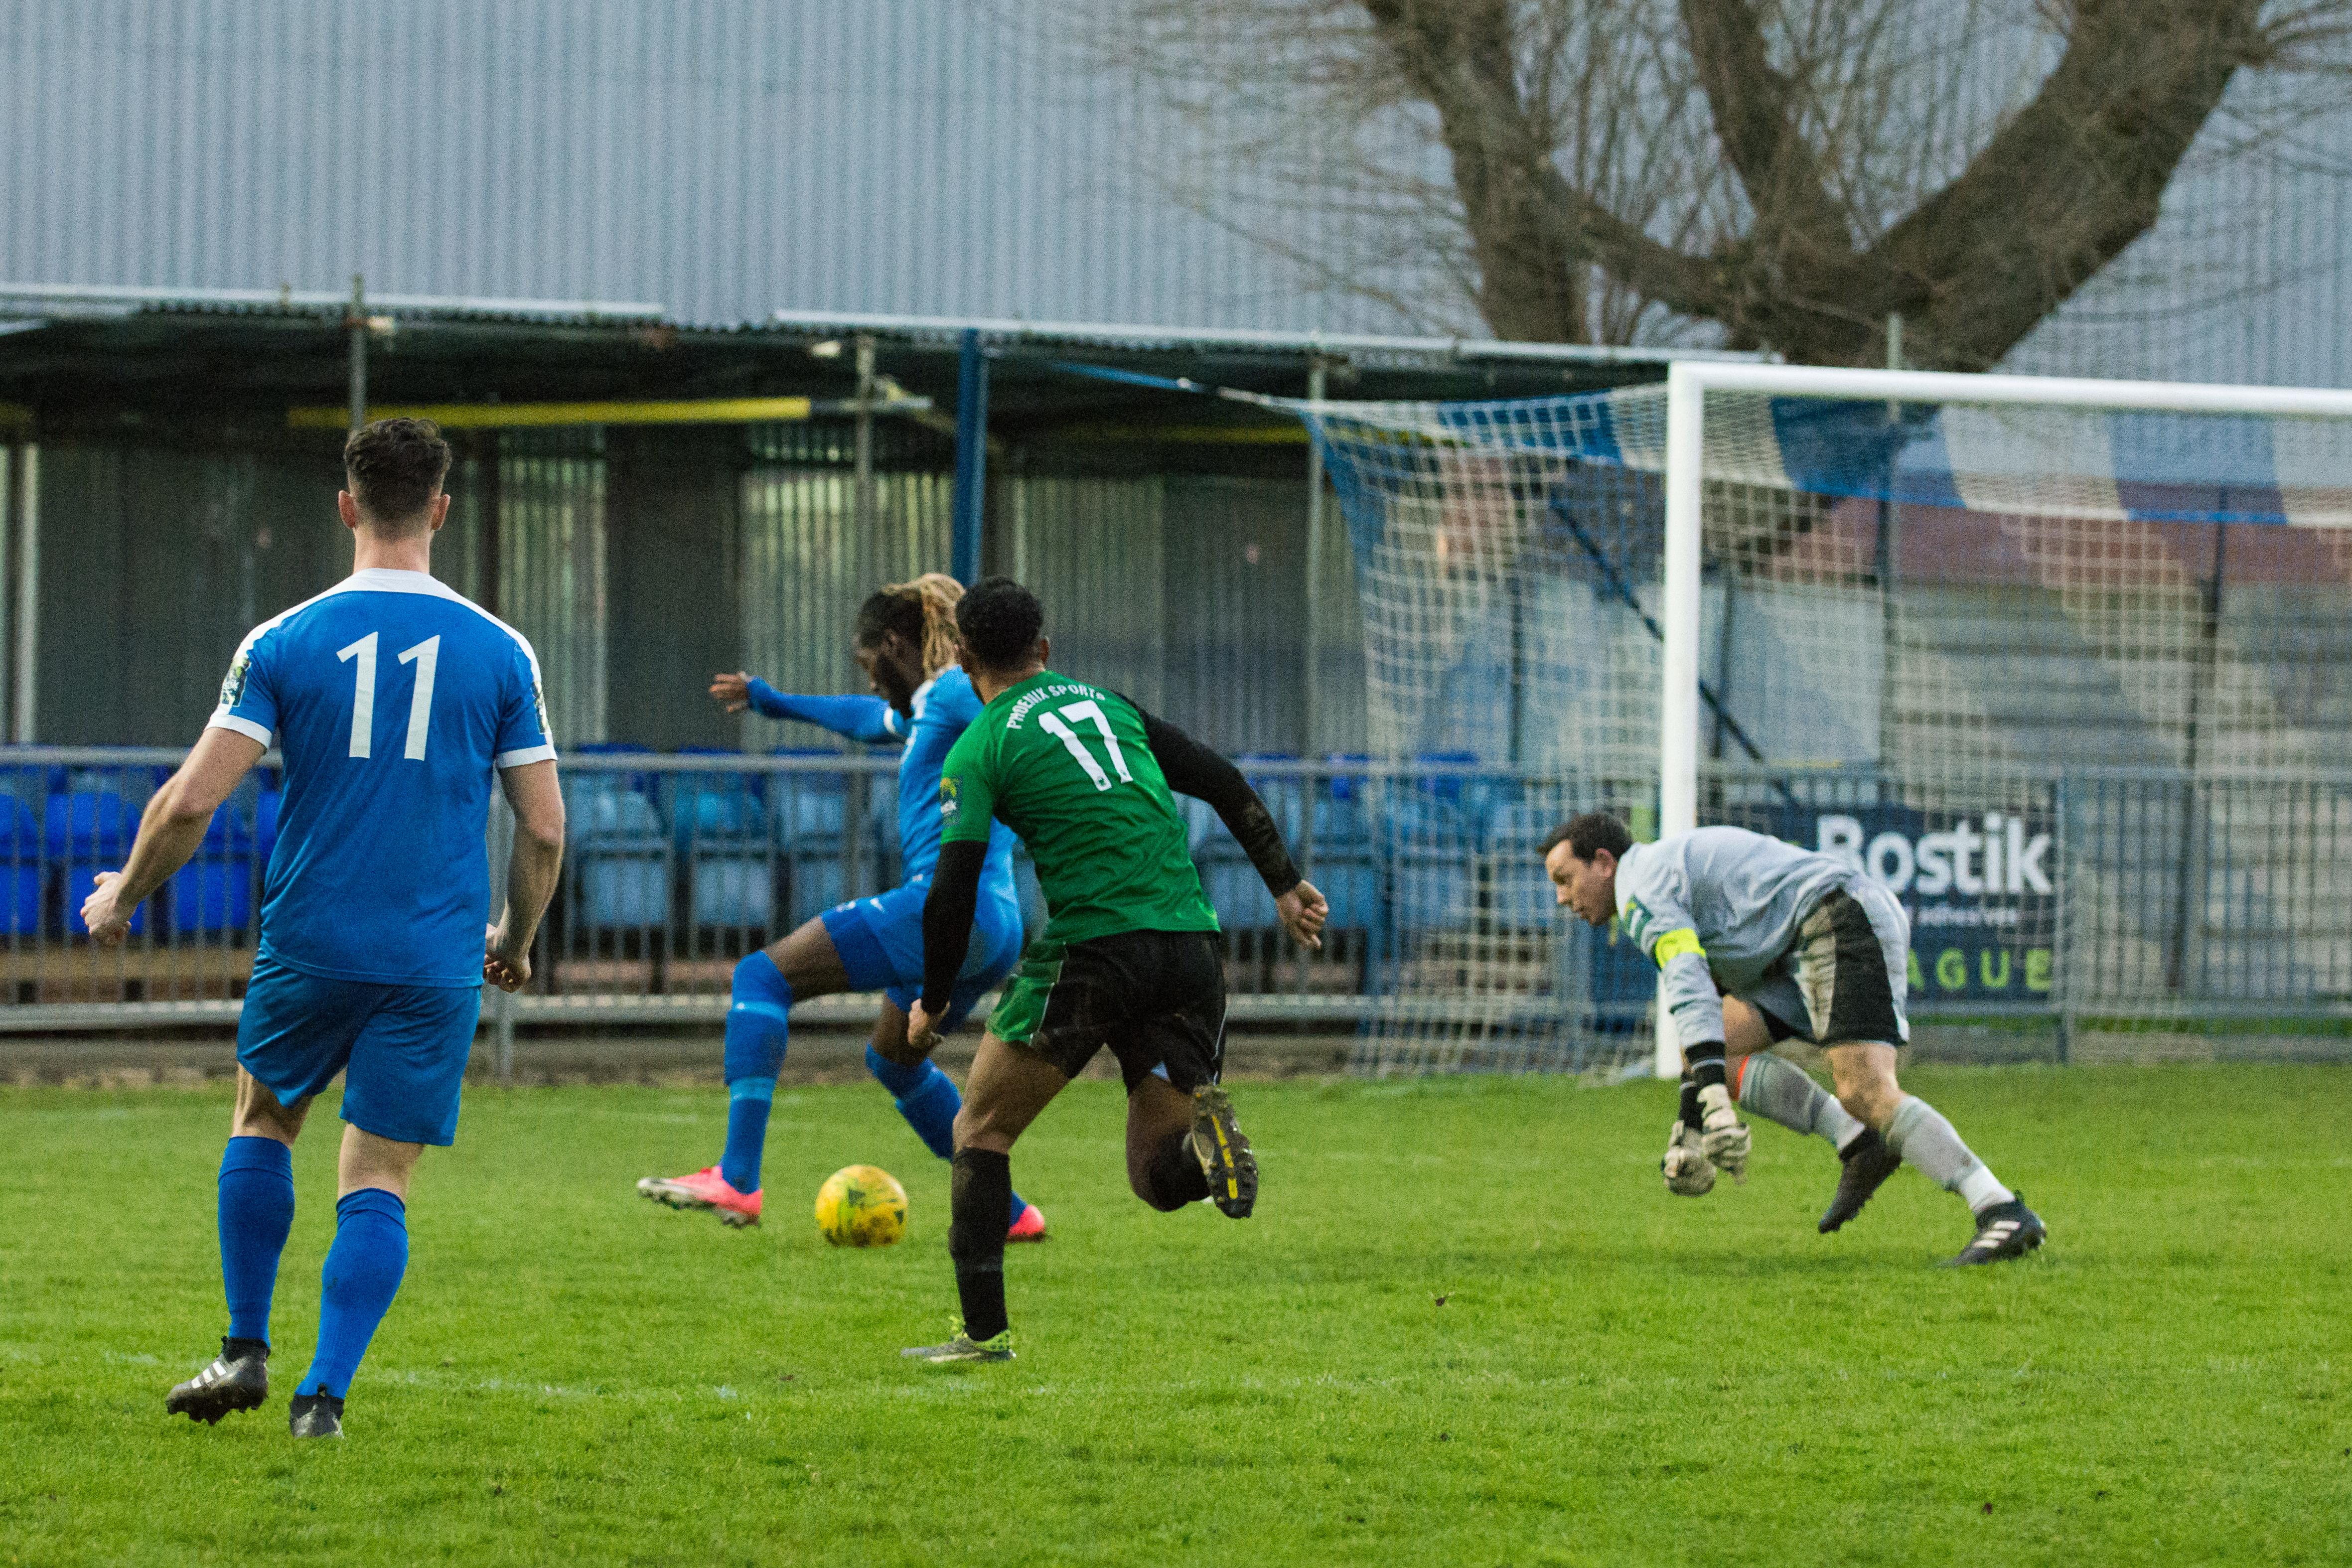 Shoreham FC vs Phoenix Sports 13.01.18 40